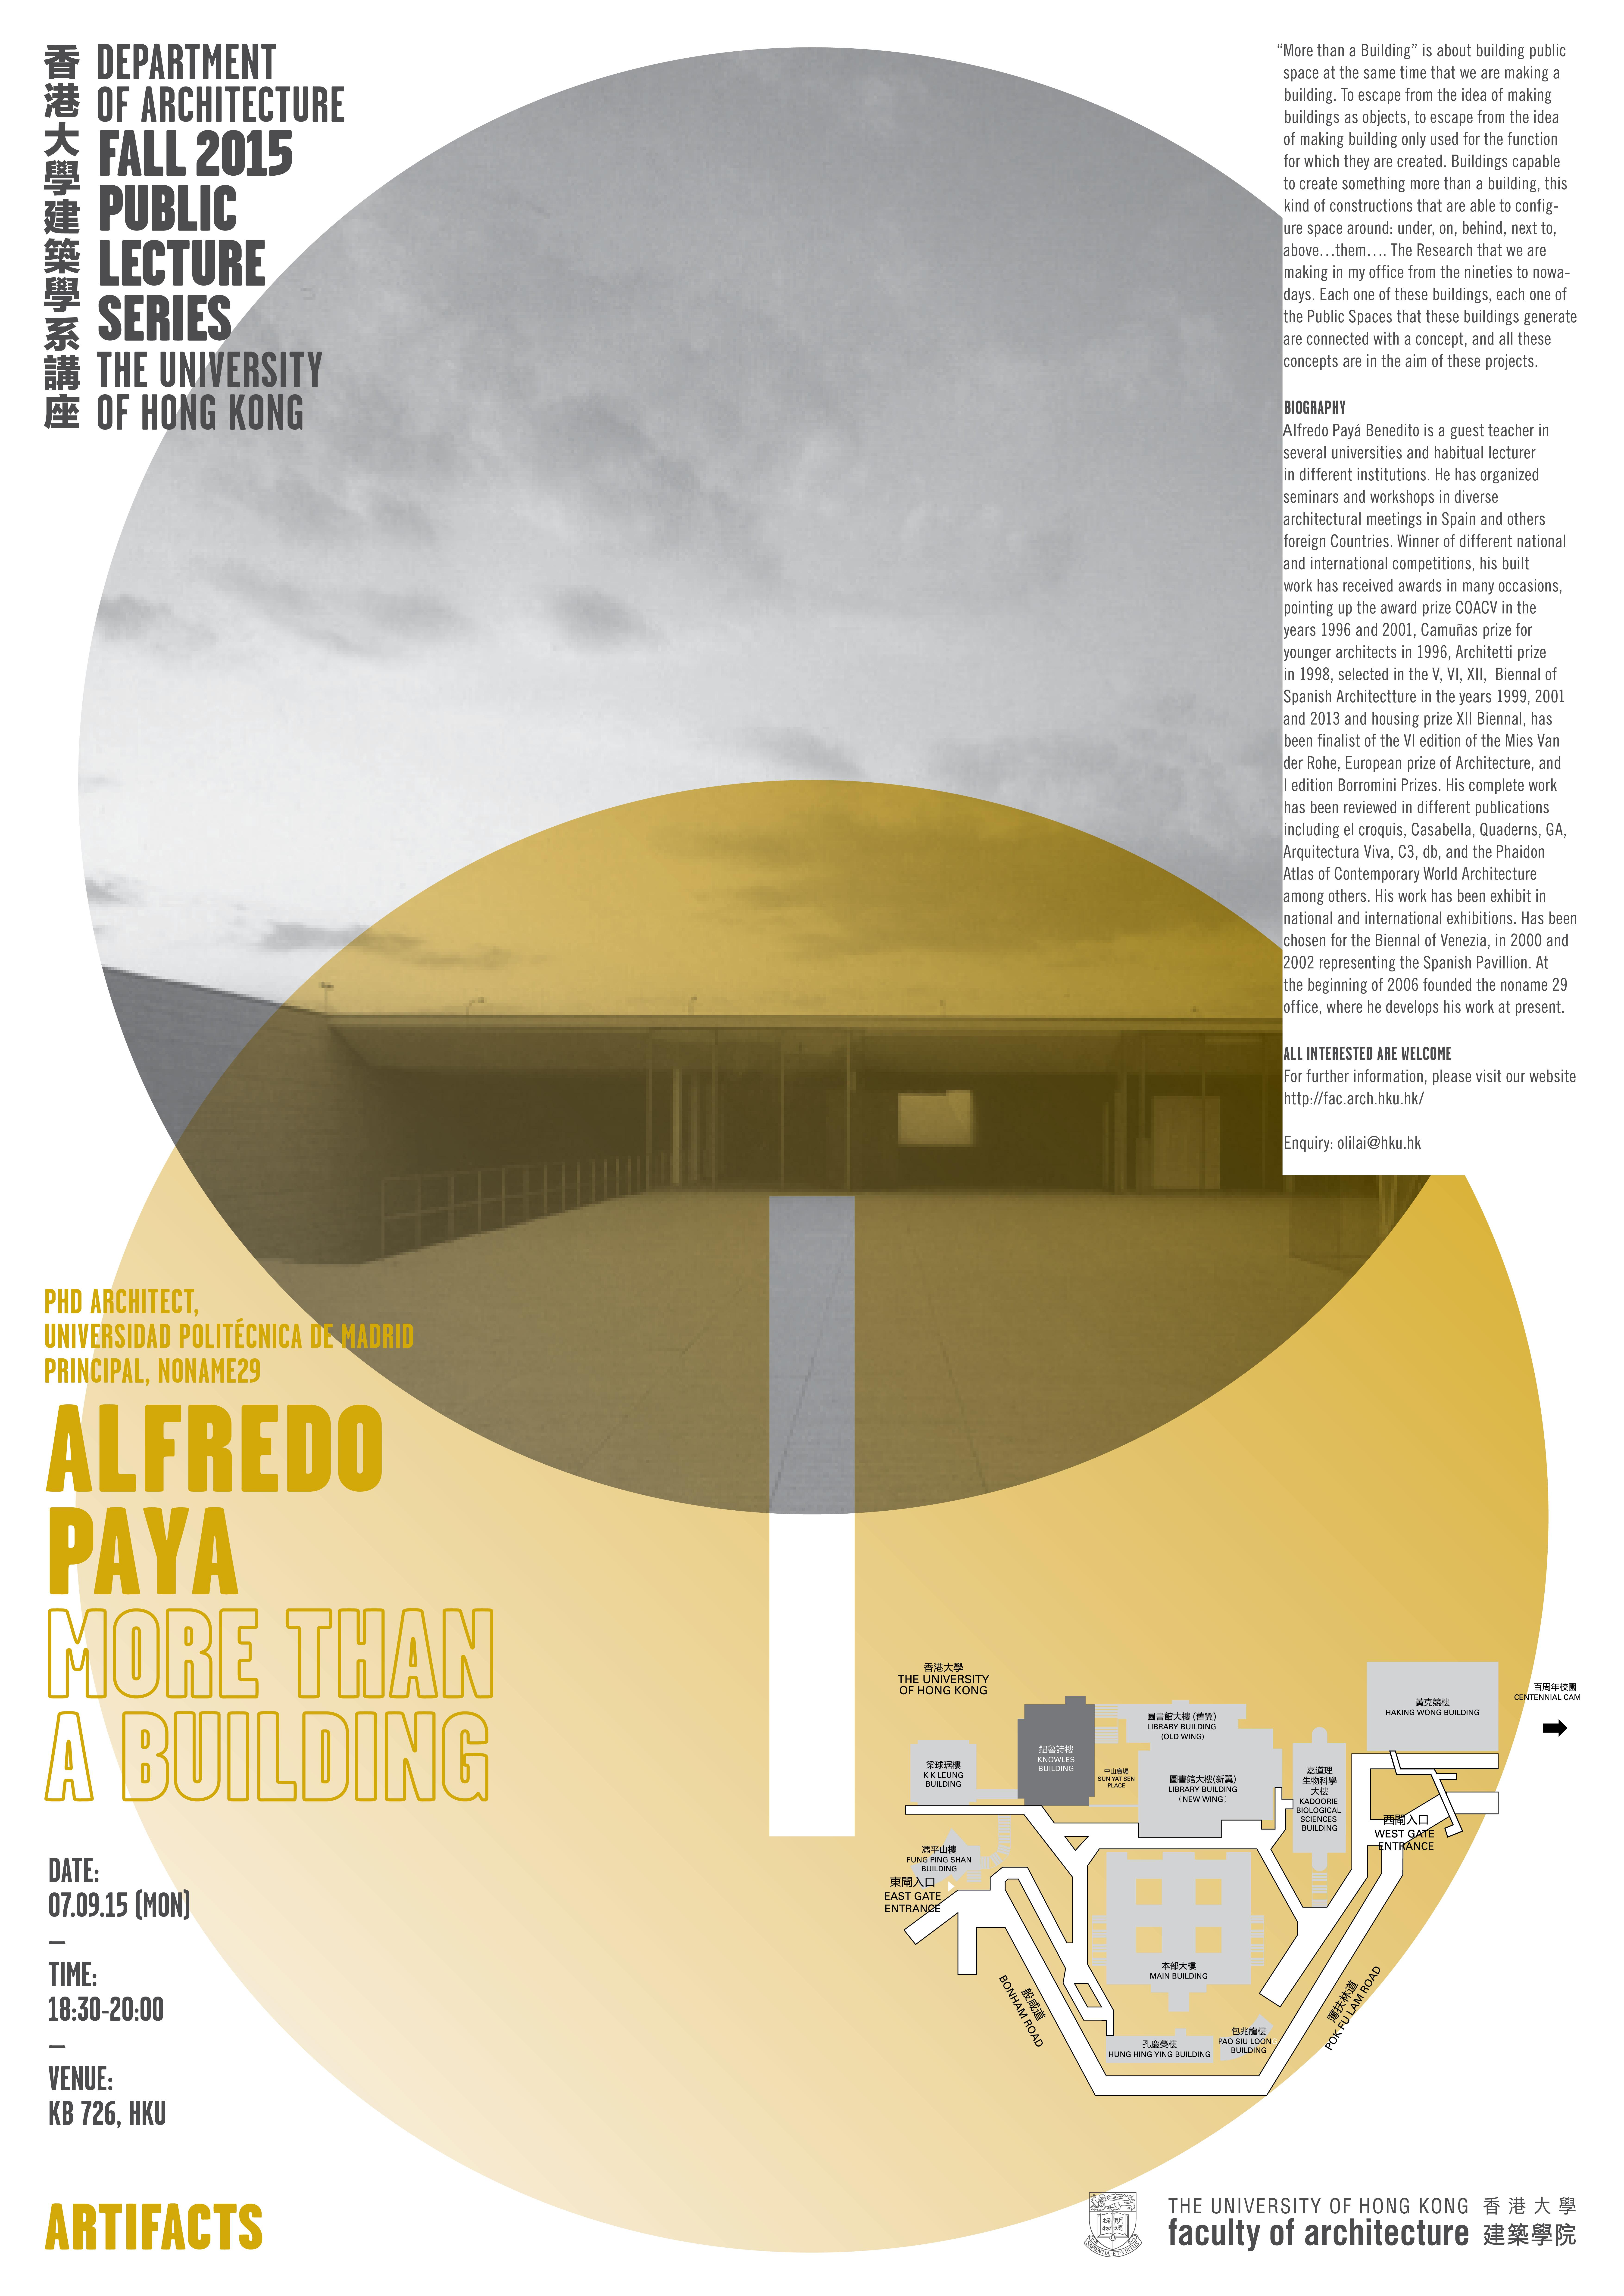 Alfredo Payá